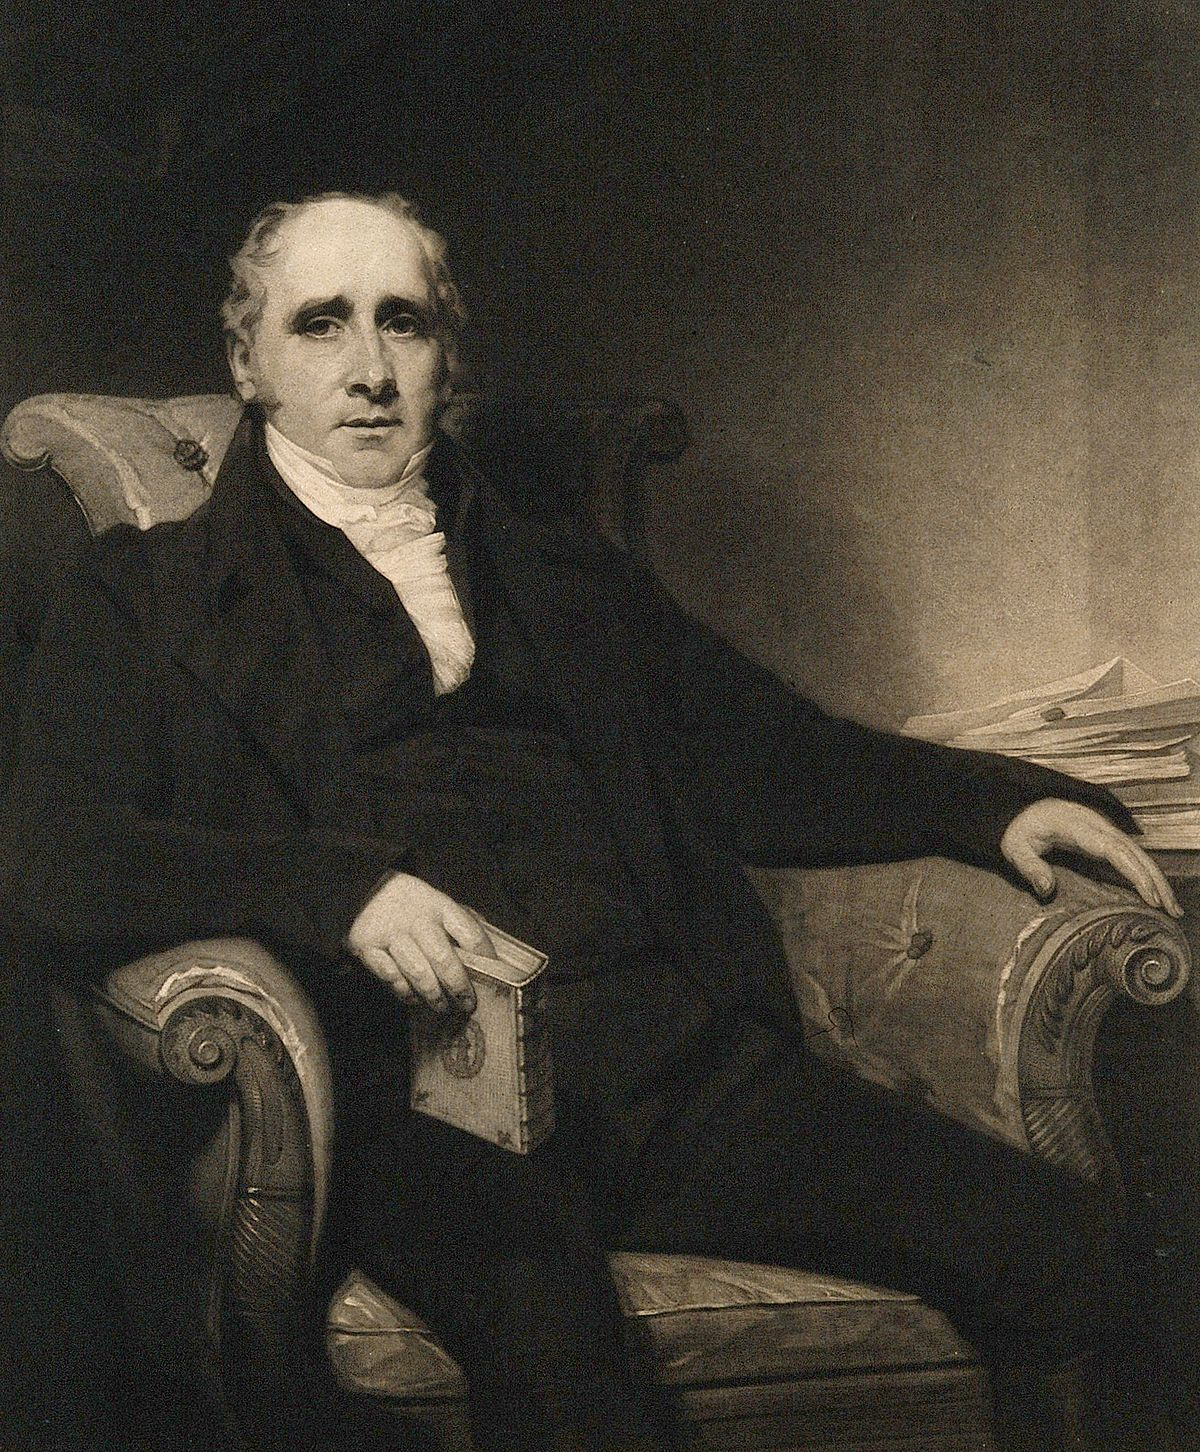 Thomas Hope